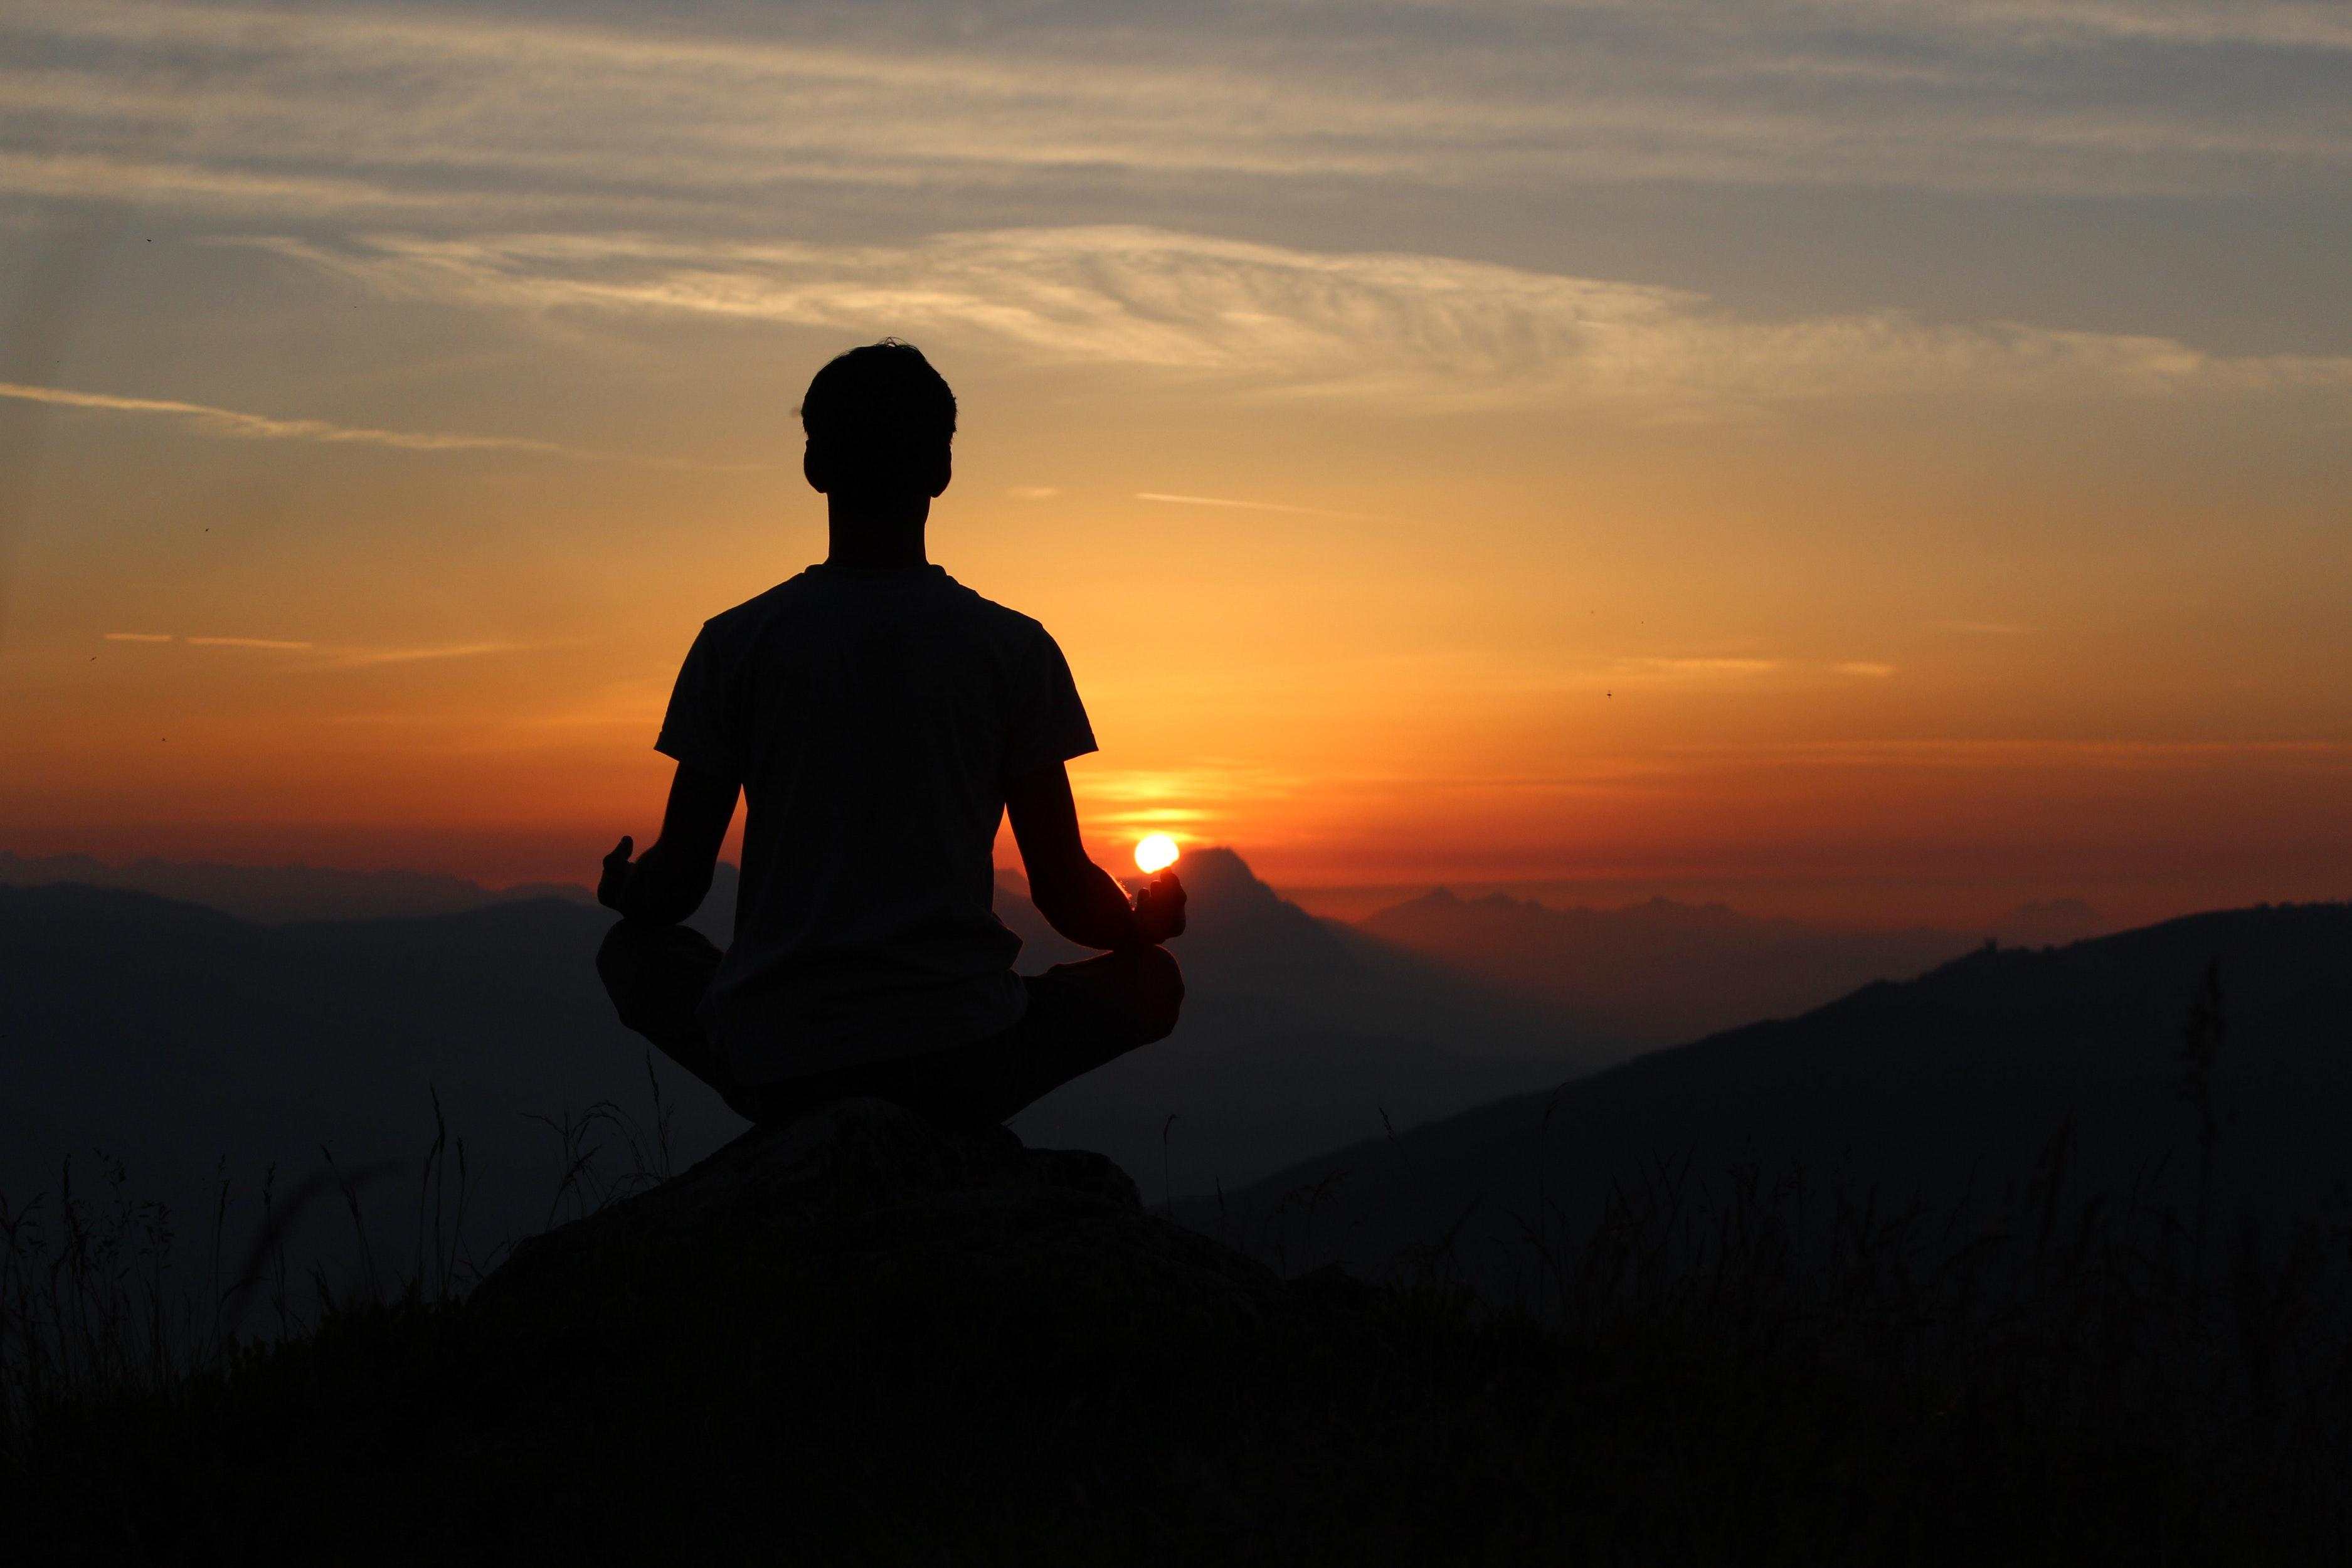 Veterans Find Healing Through Yoga And Meditation